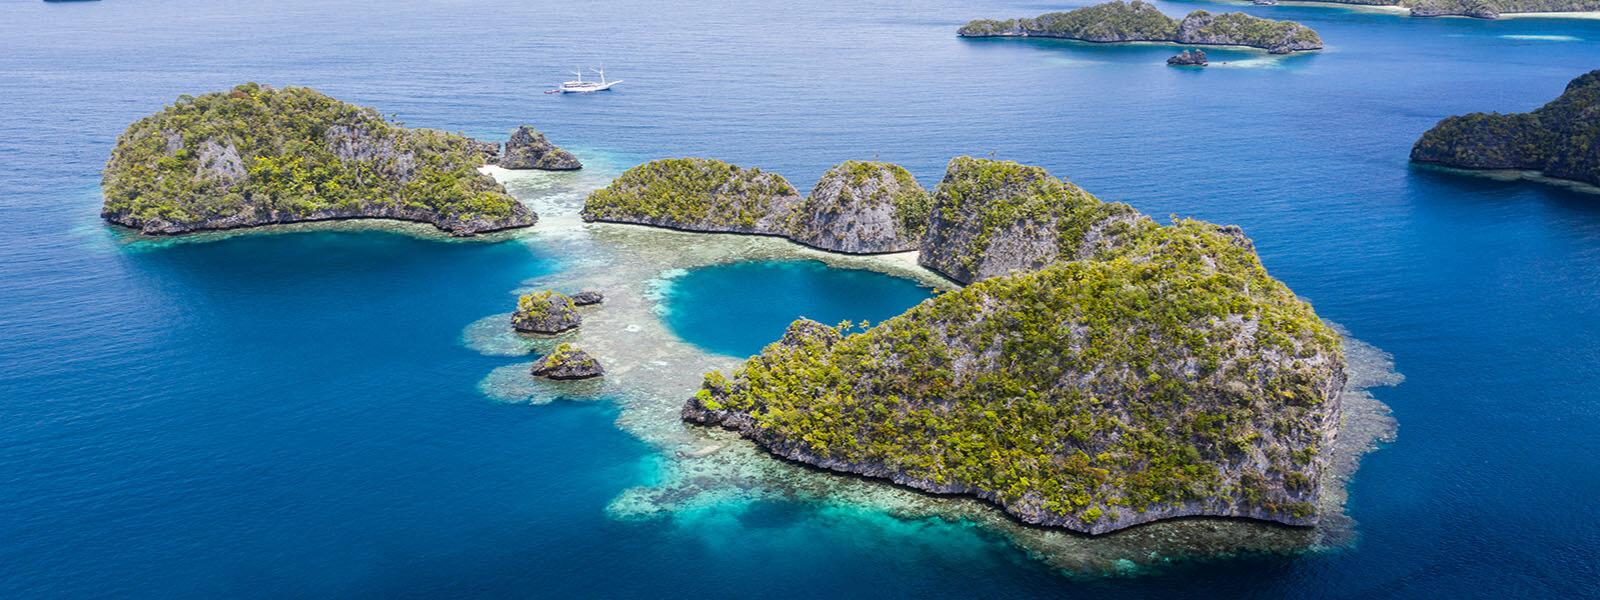 We snorkel the reefs around the limestone islands of Msiool, Raja Ampat